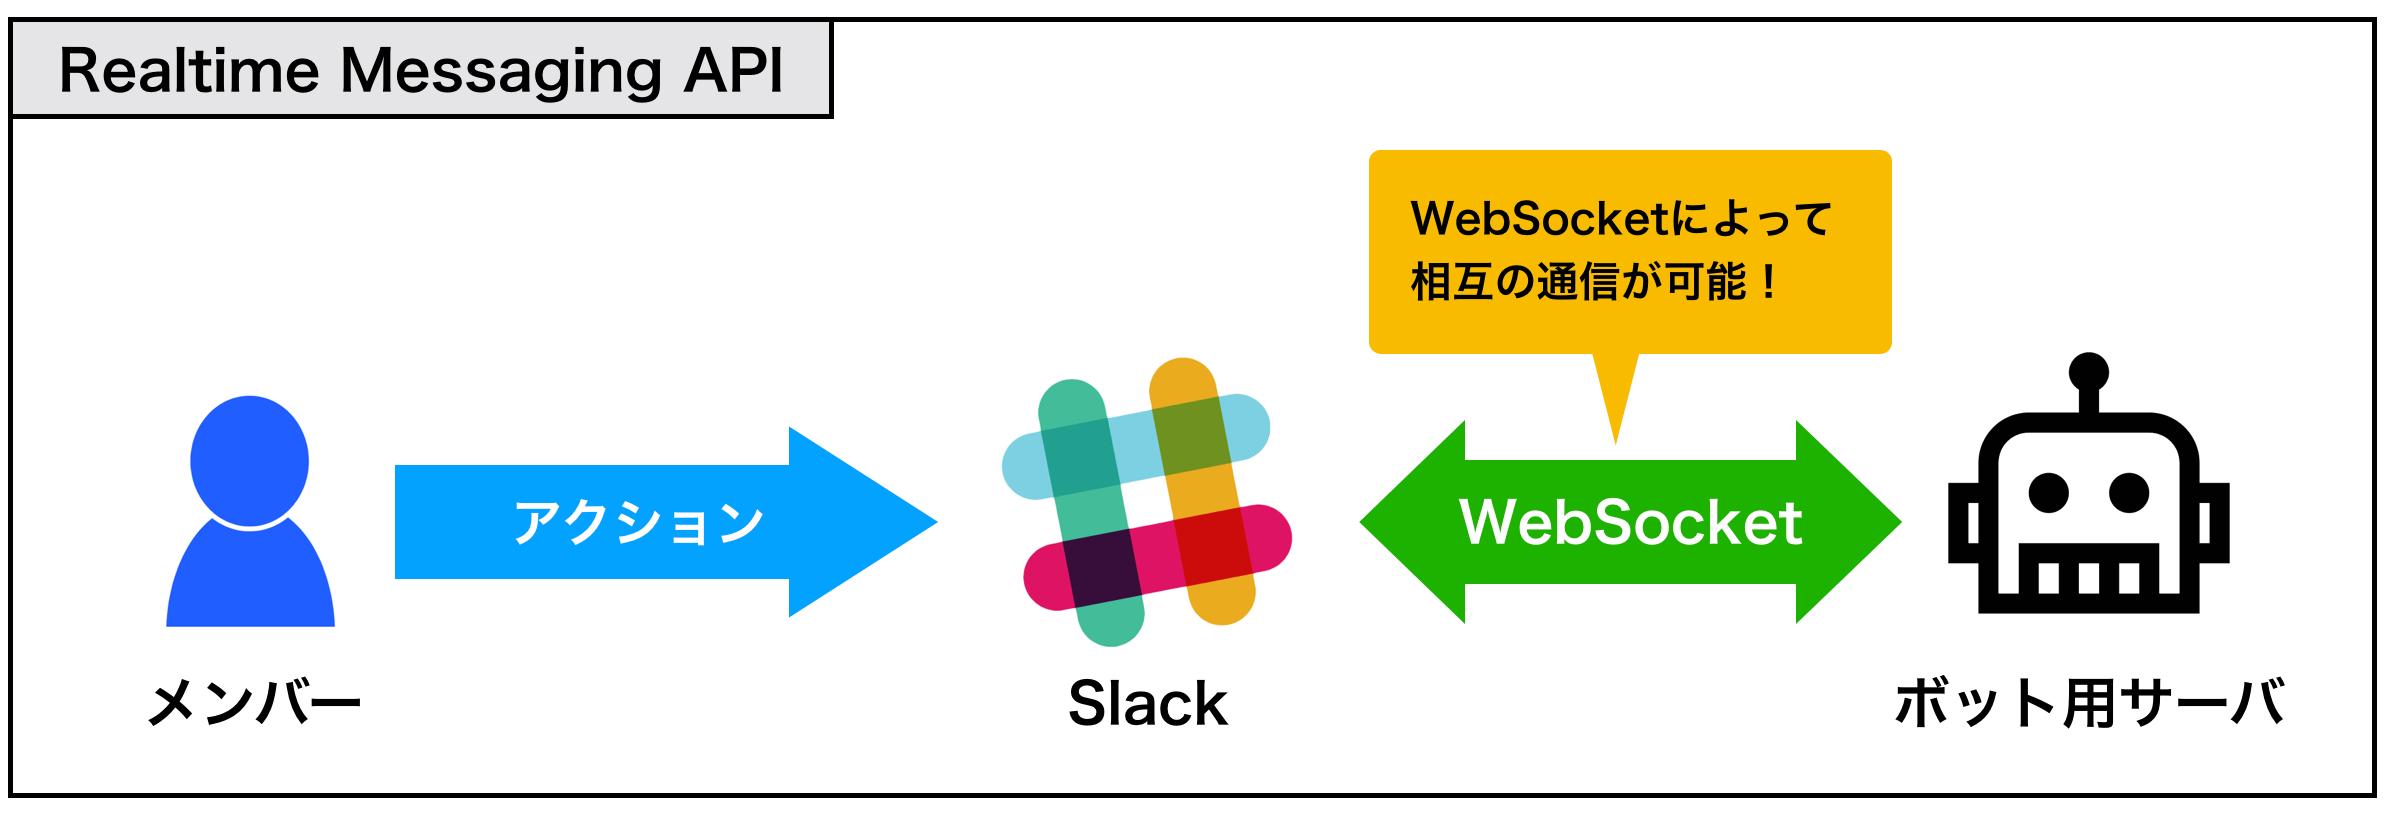 websocket.png